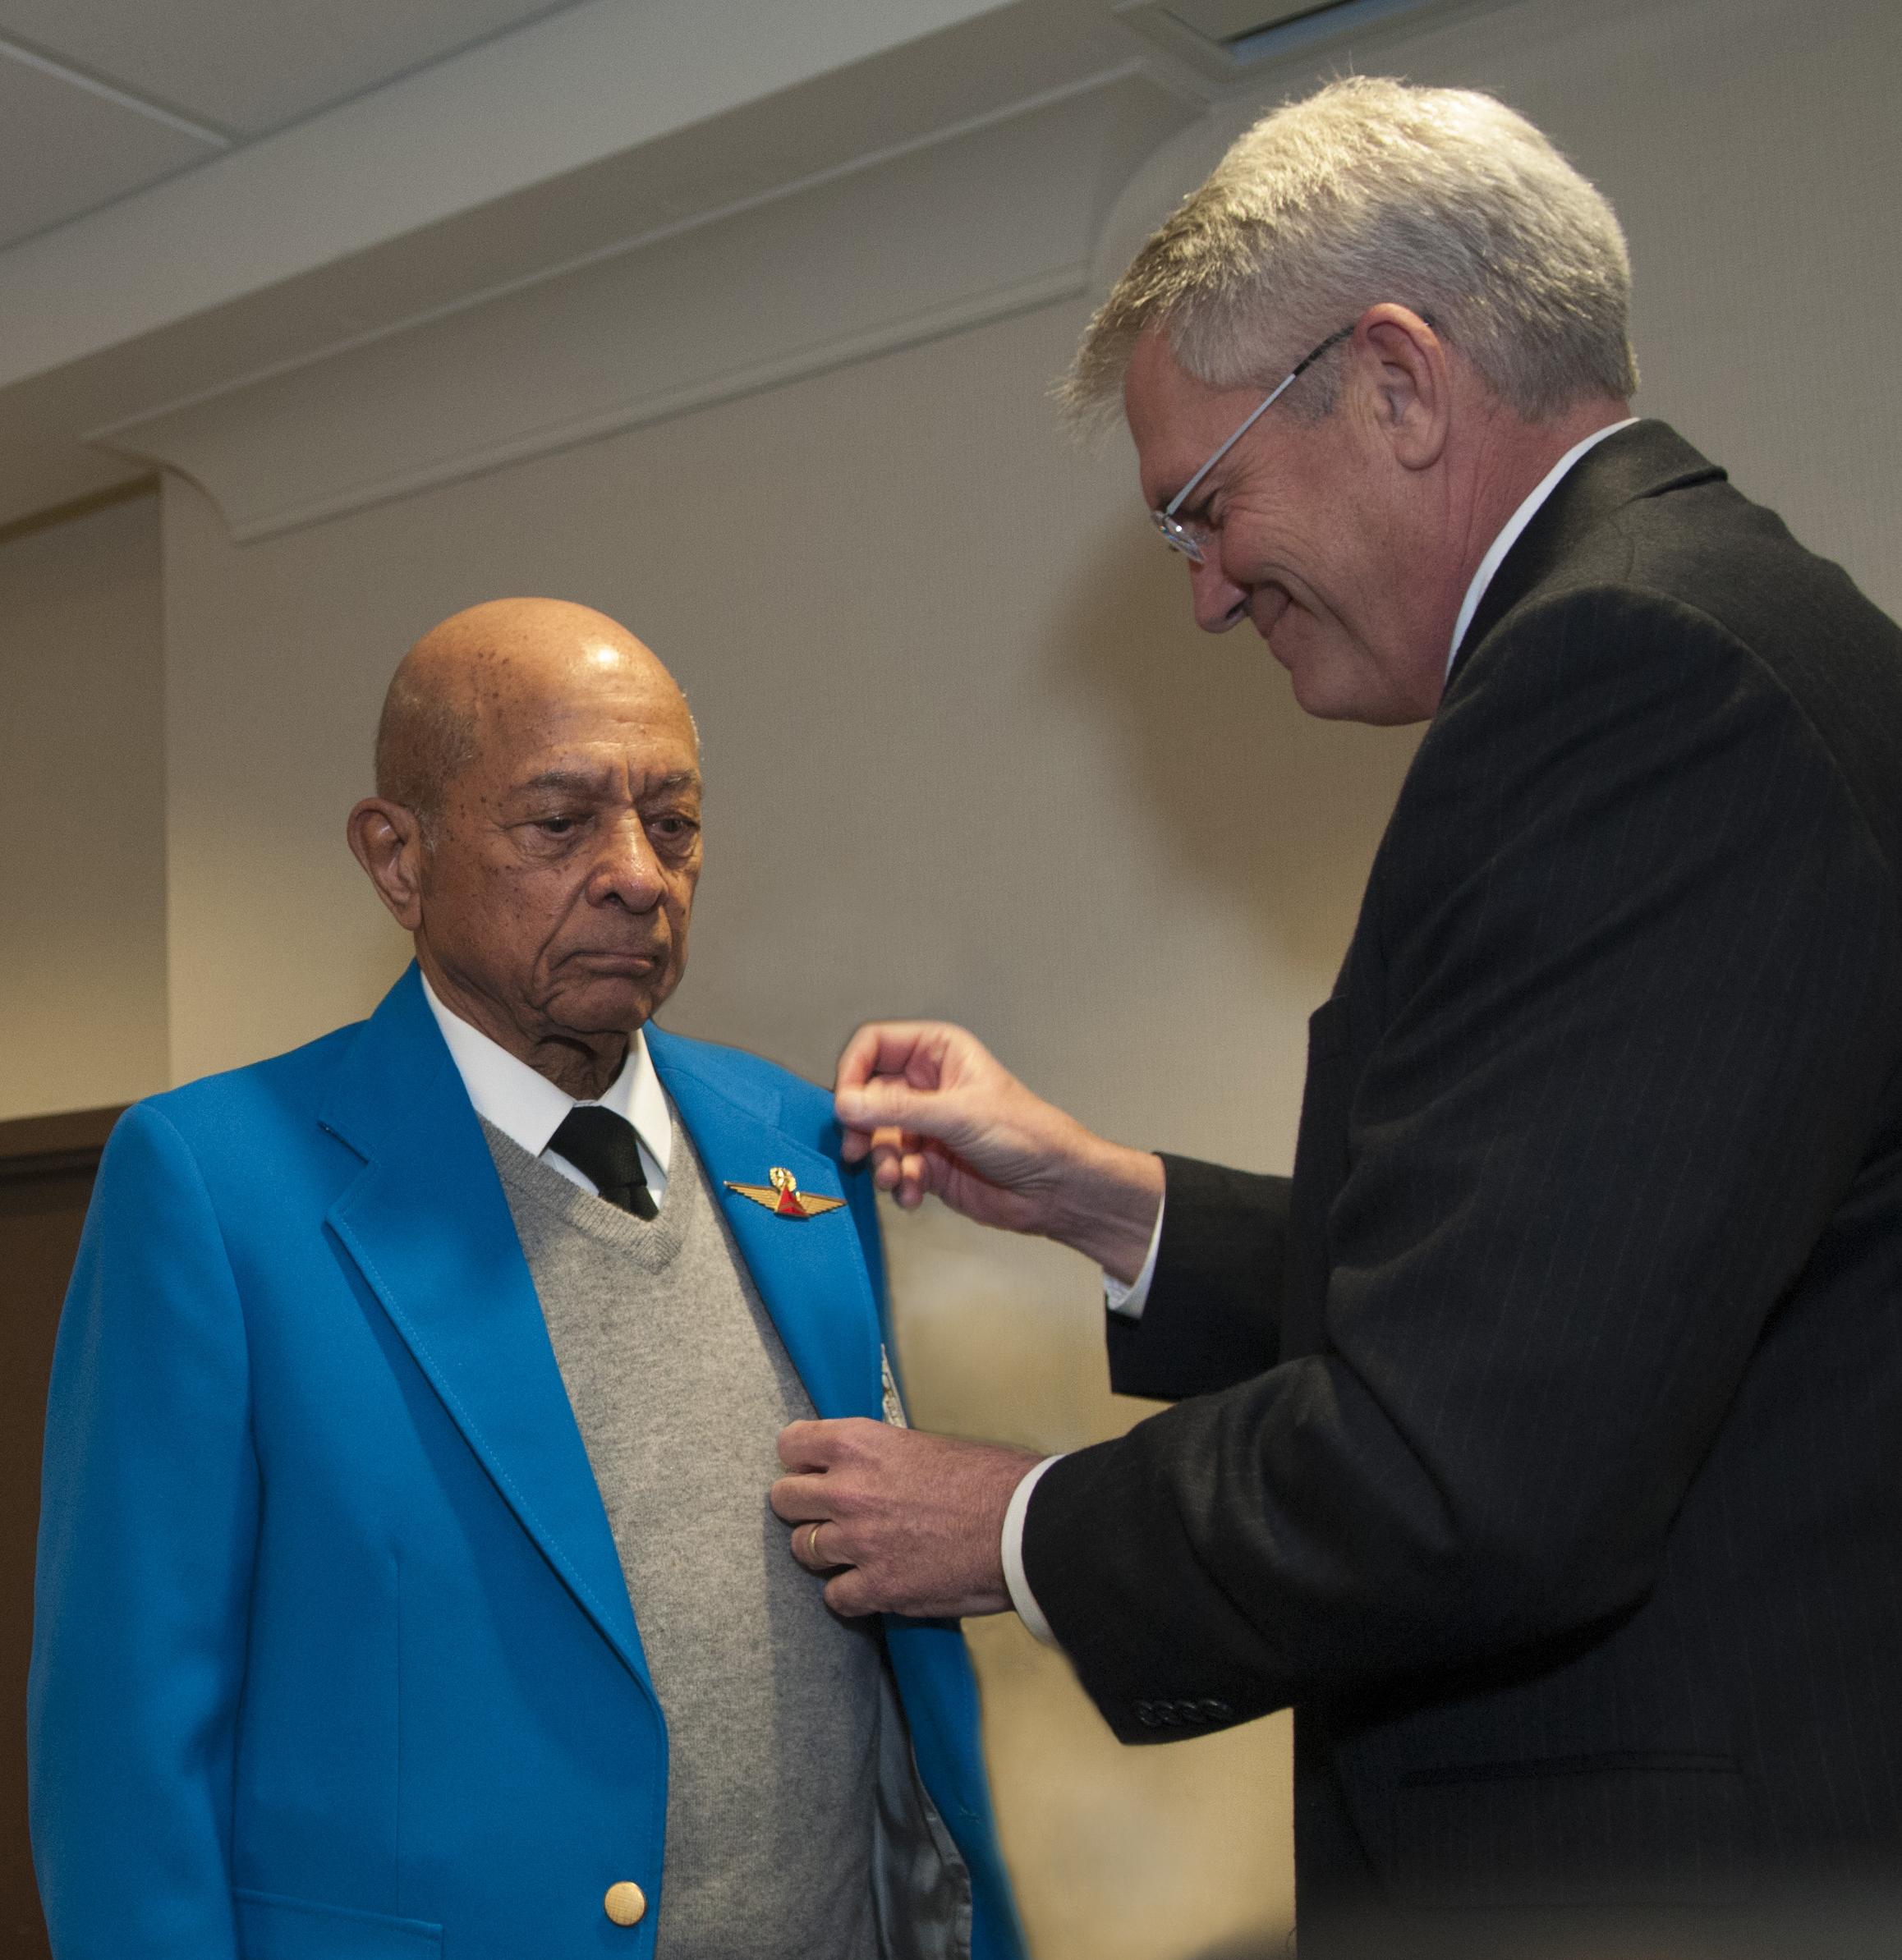 Lt. Col. Harry Stewart being pinned by Jim Graham